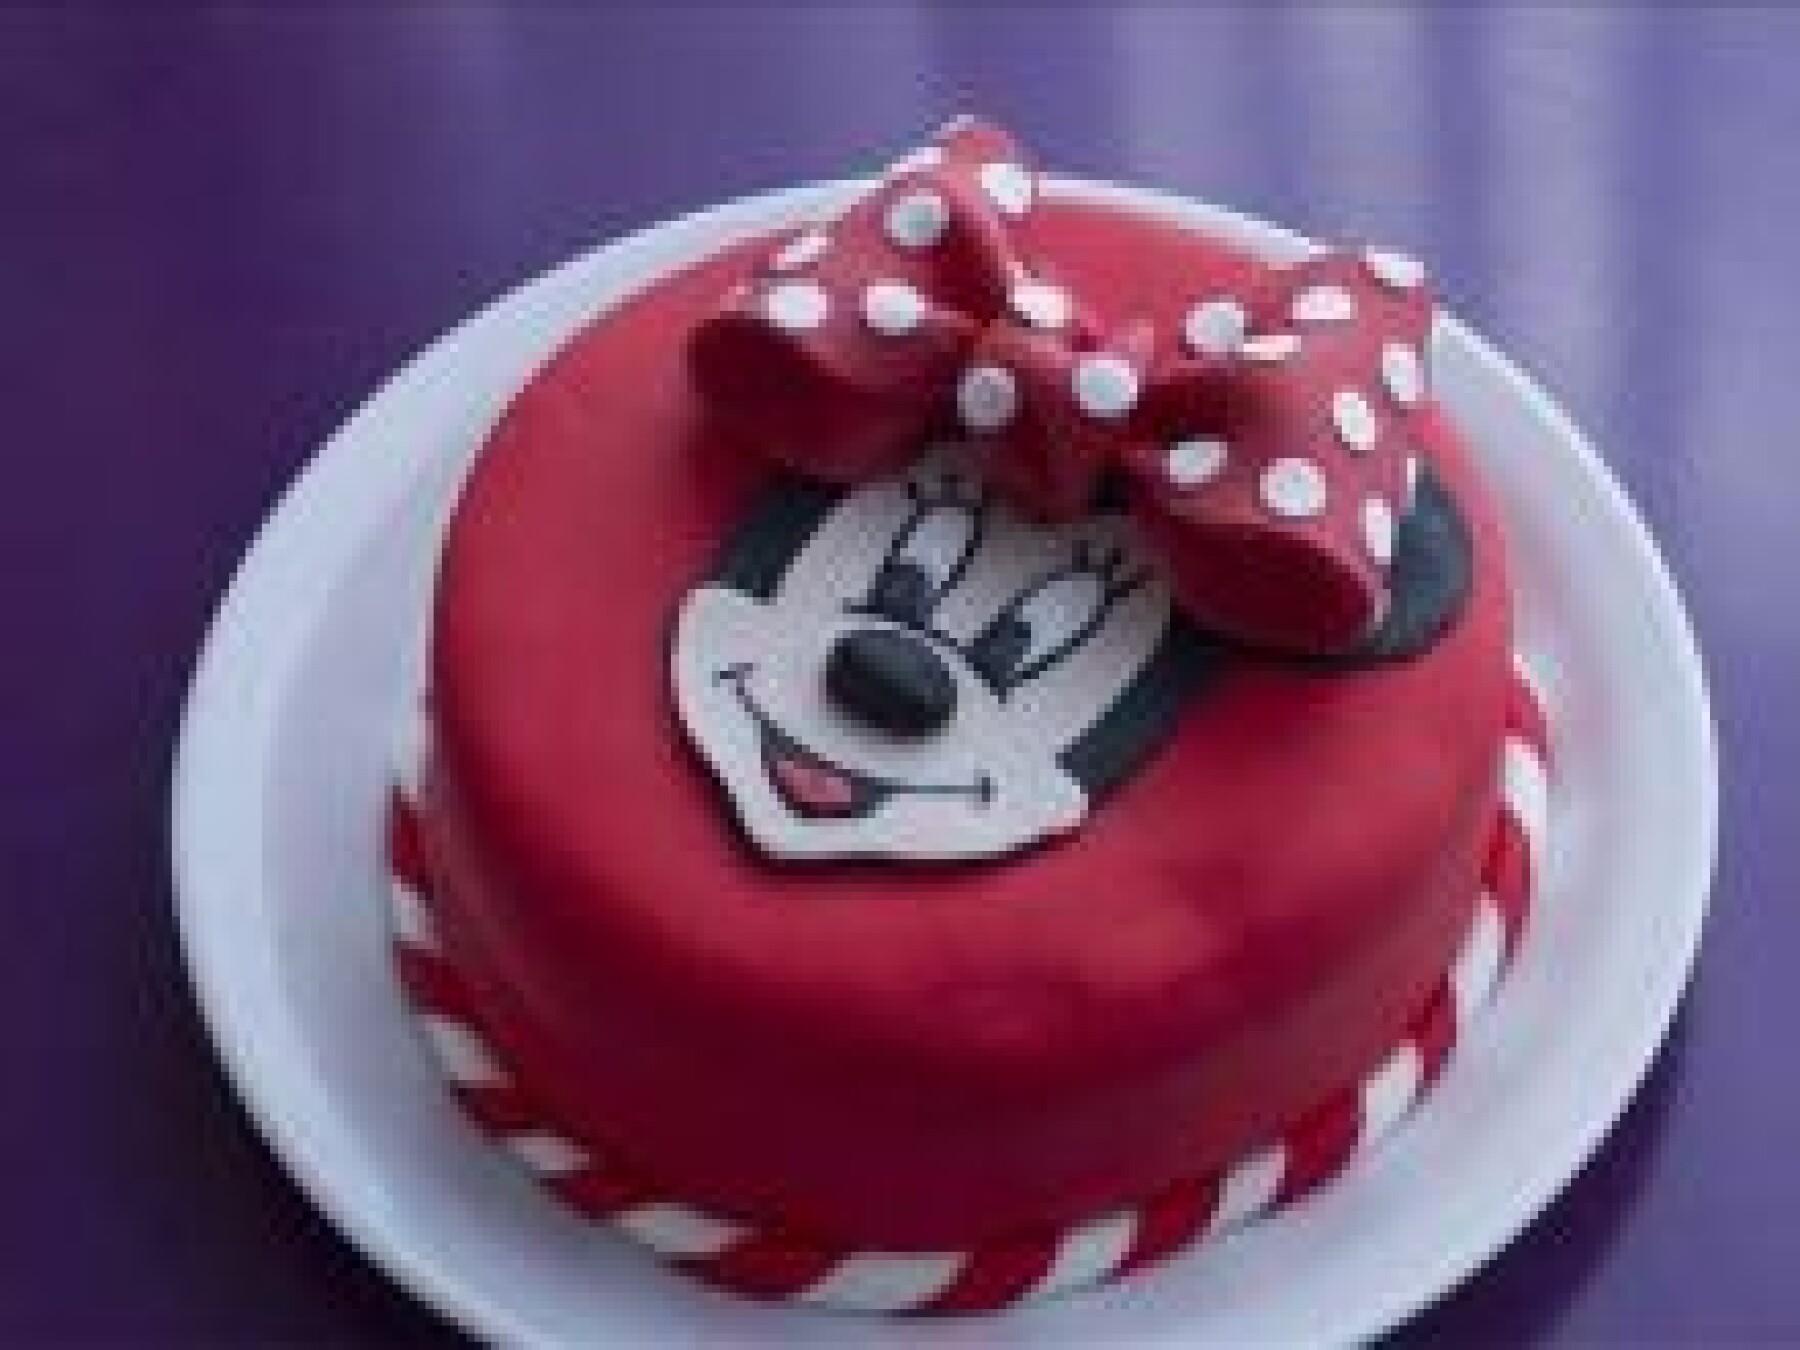 Le gâteau Minnie